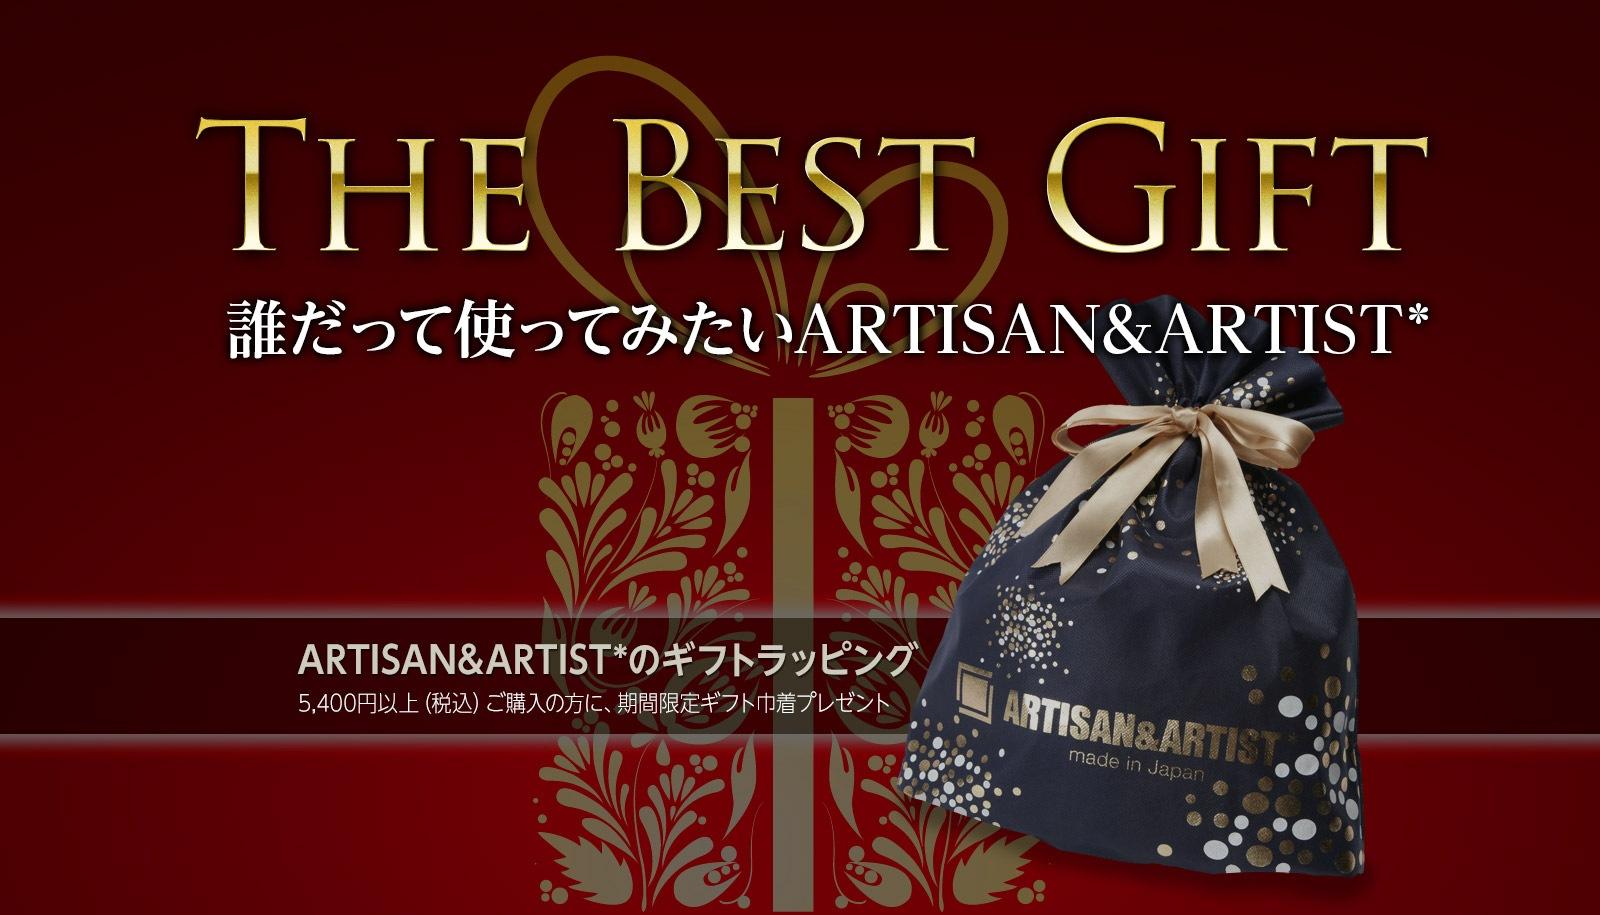 The Best Gift -誰だって使ってみたいARTISAN&ARTIST*